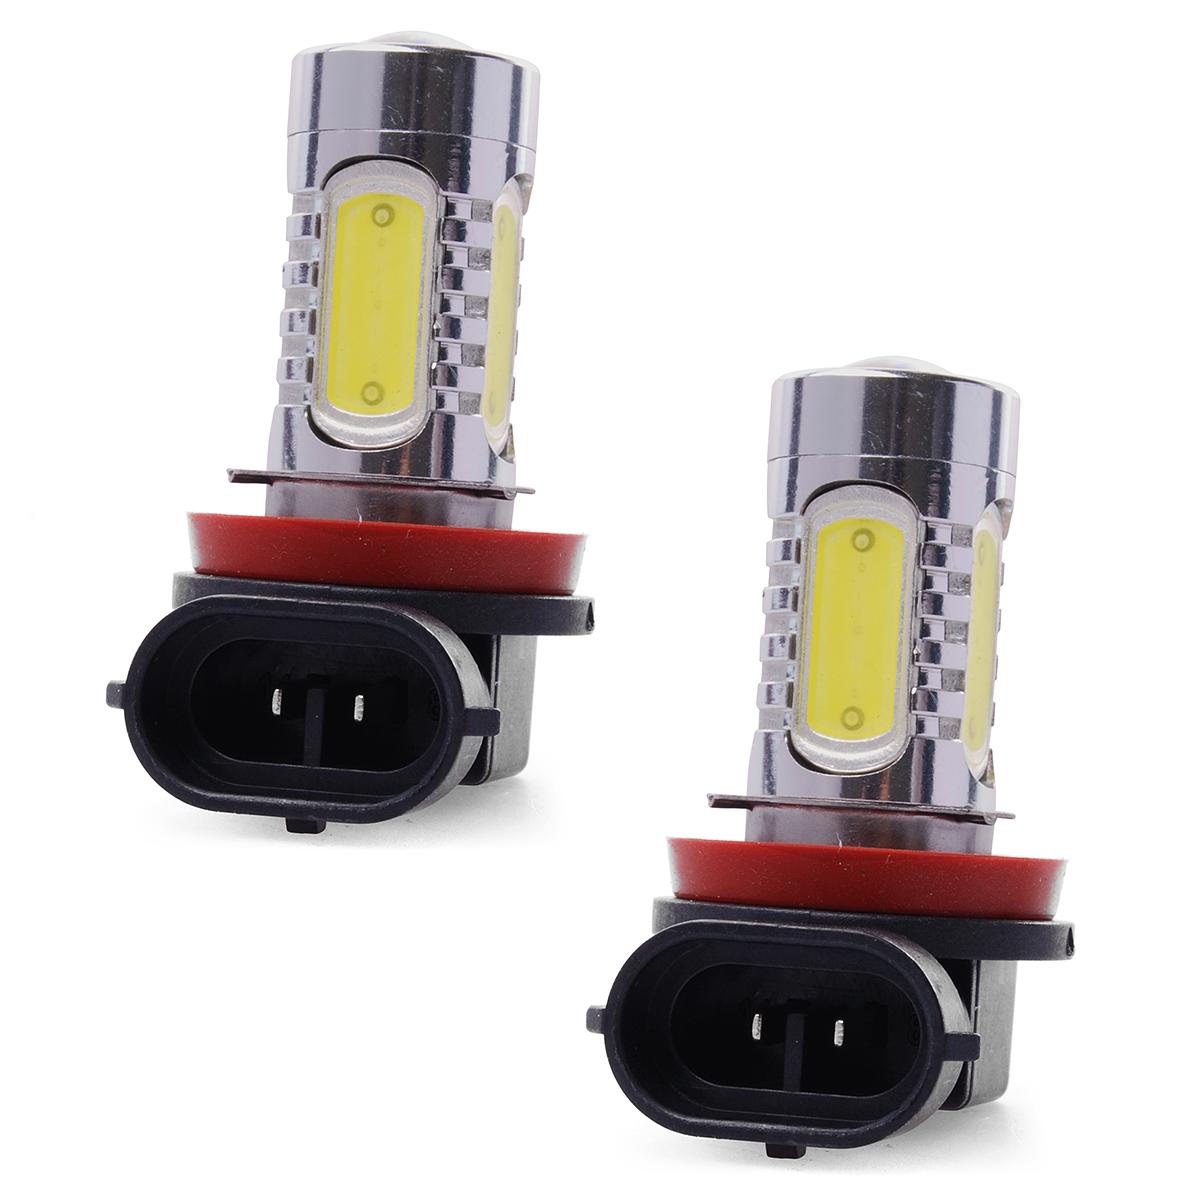 2 pcs Car LED Fog Lights H11 7.5W 10-30V Daytime Drive COB DRL Front Lamp High Power White Bulb 20mm LD310(China (Mainland))